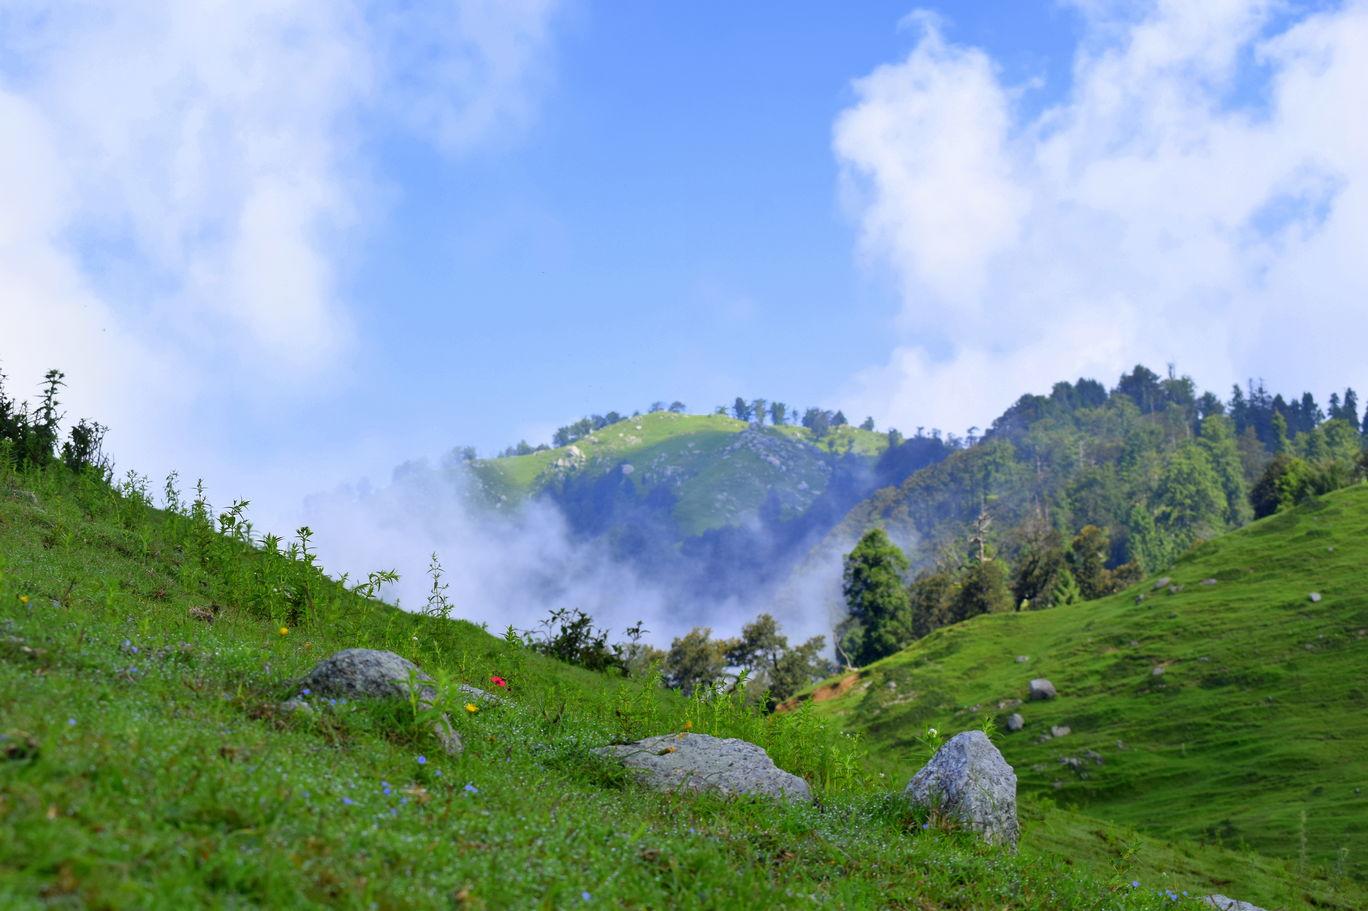 Photo of Dainkund Trek & Khajjiar - Only Pictures By Raman oberoi